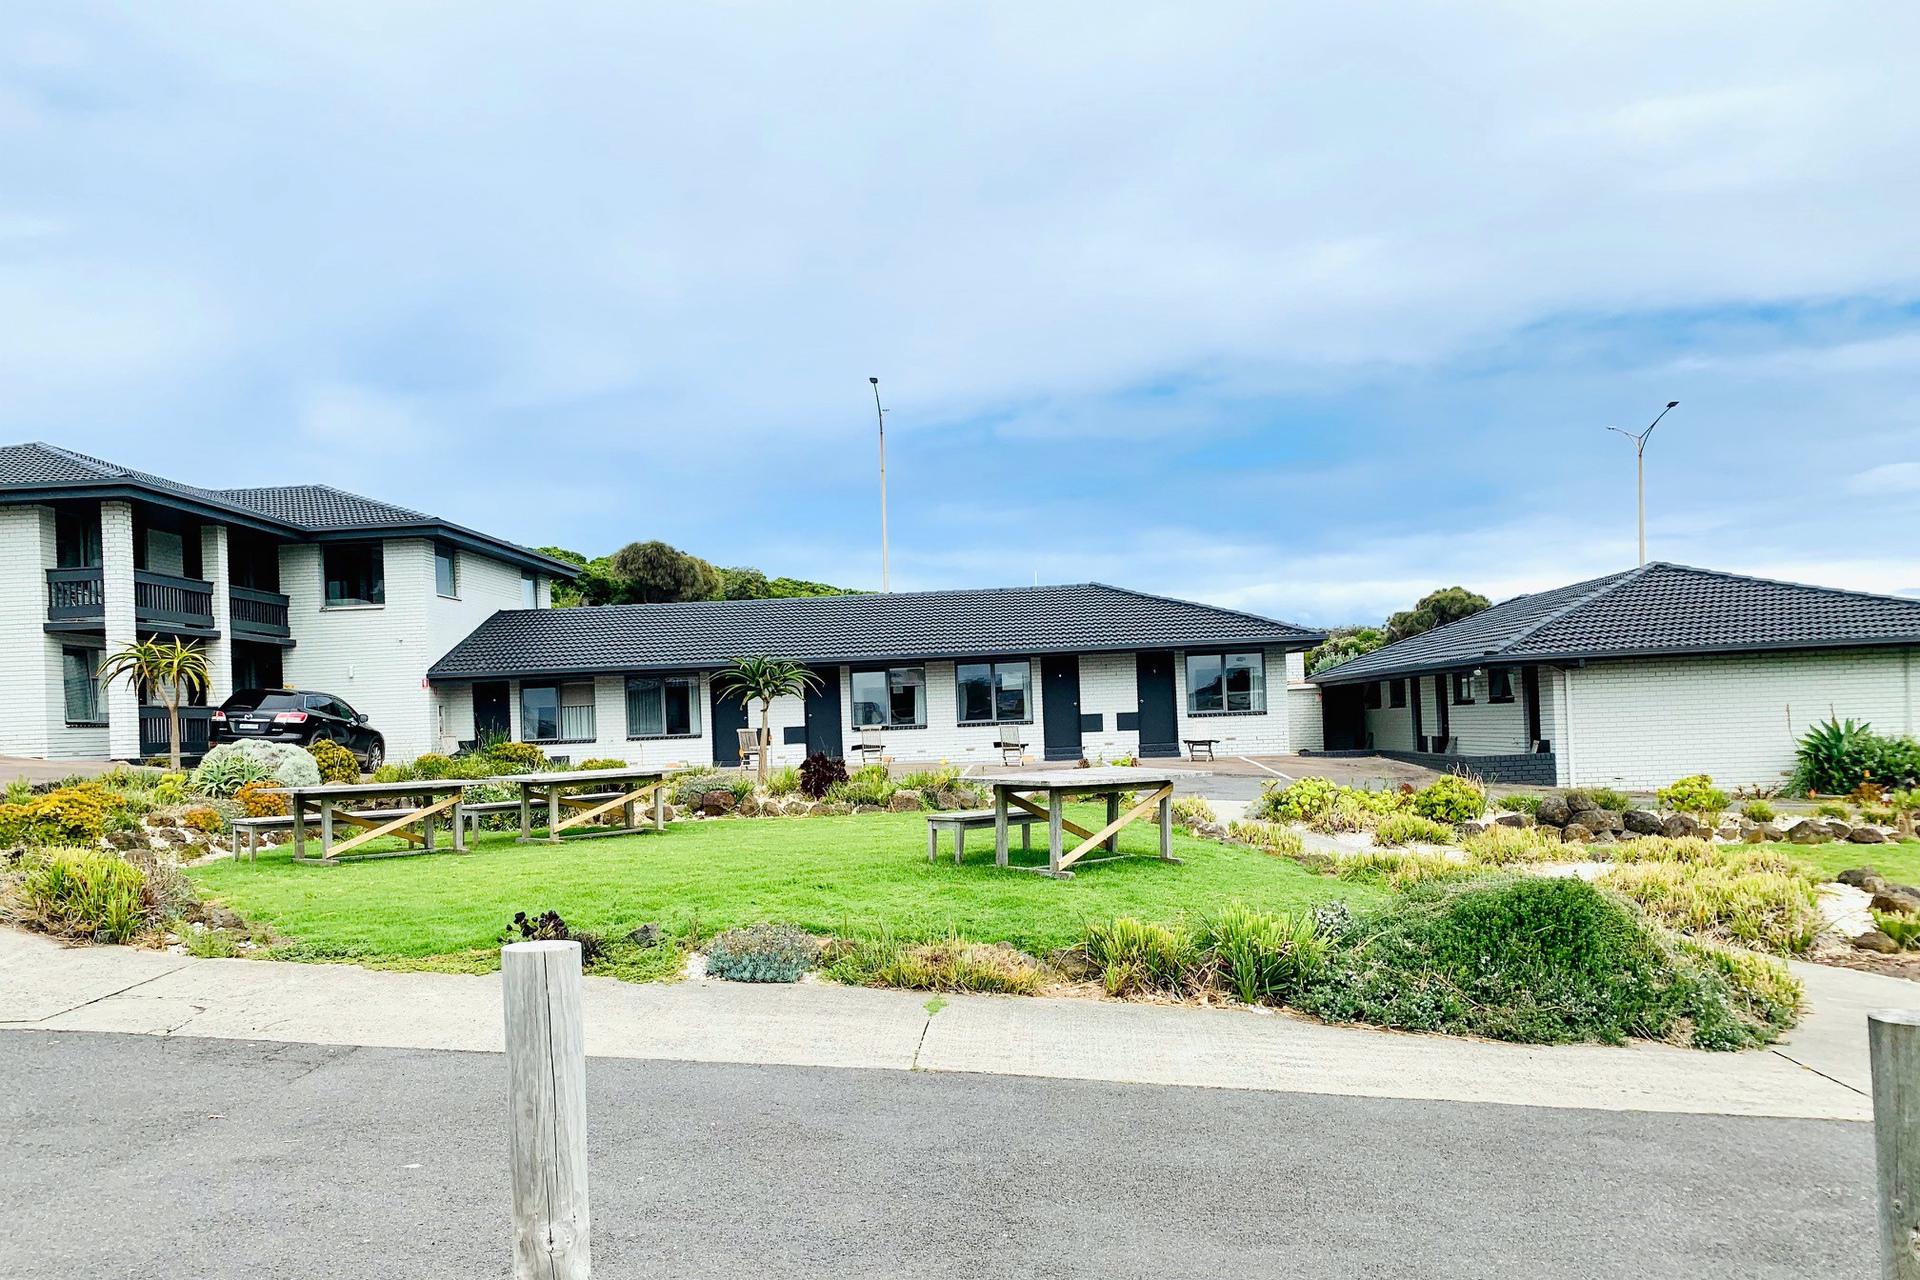 c - Southern Ocean Motor Inn